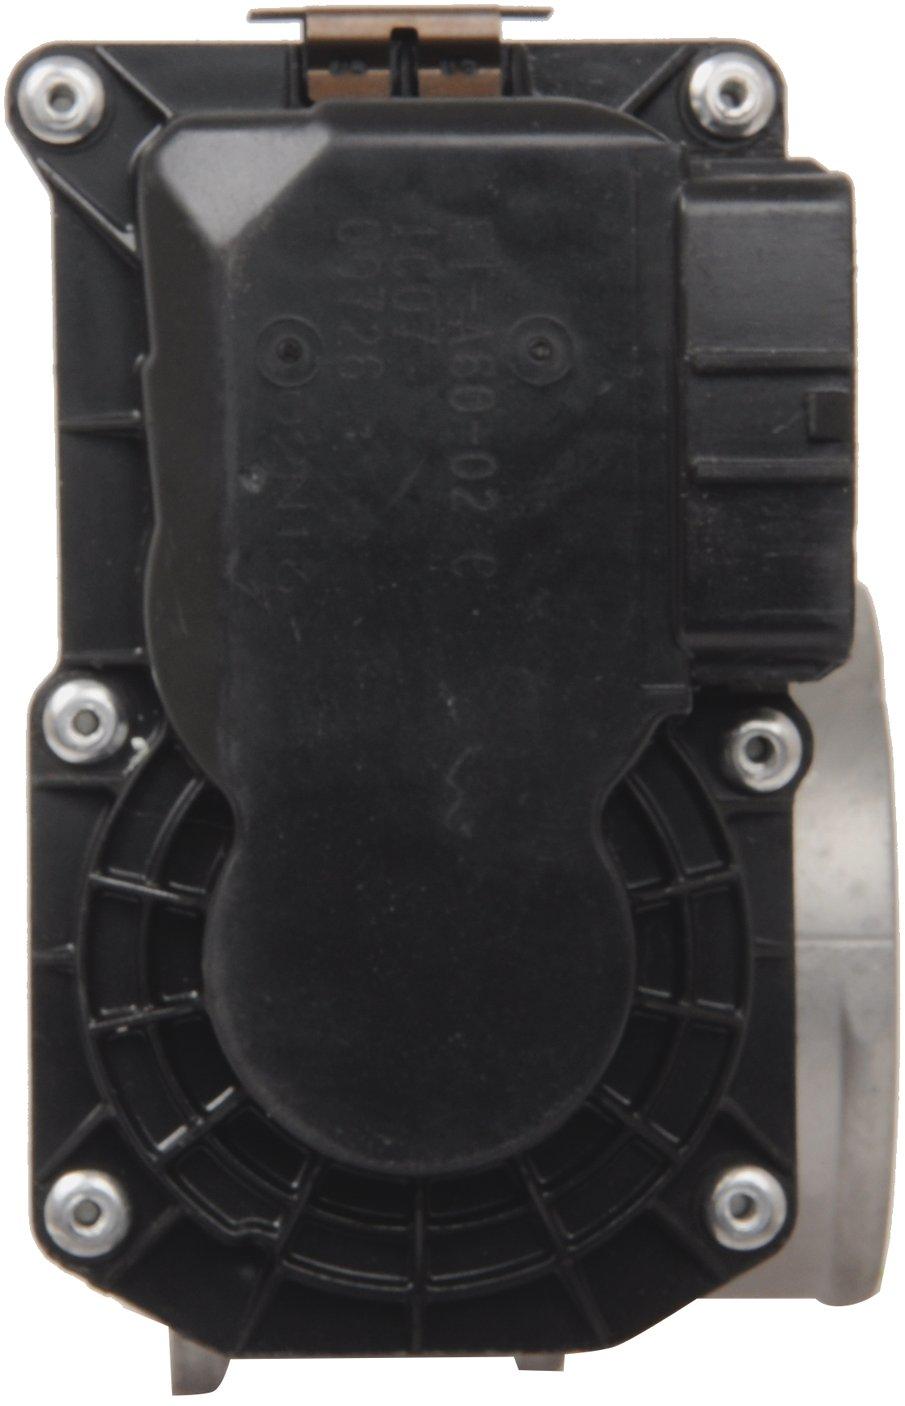 2012 Nissan Versa Fuel Injection Throttle Body Filter A1 67 0014